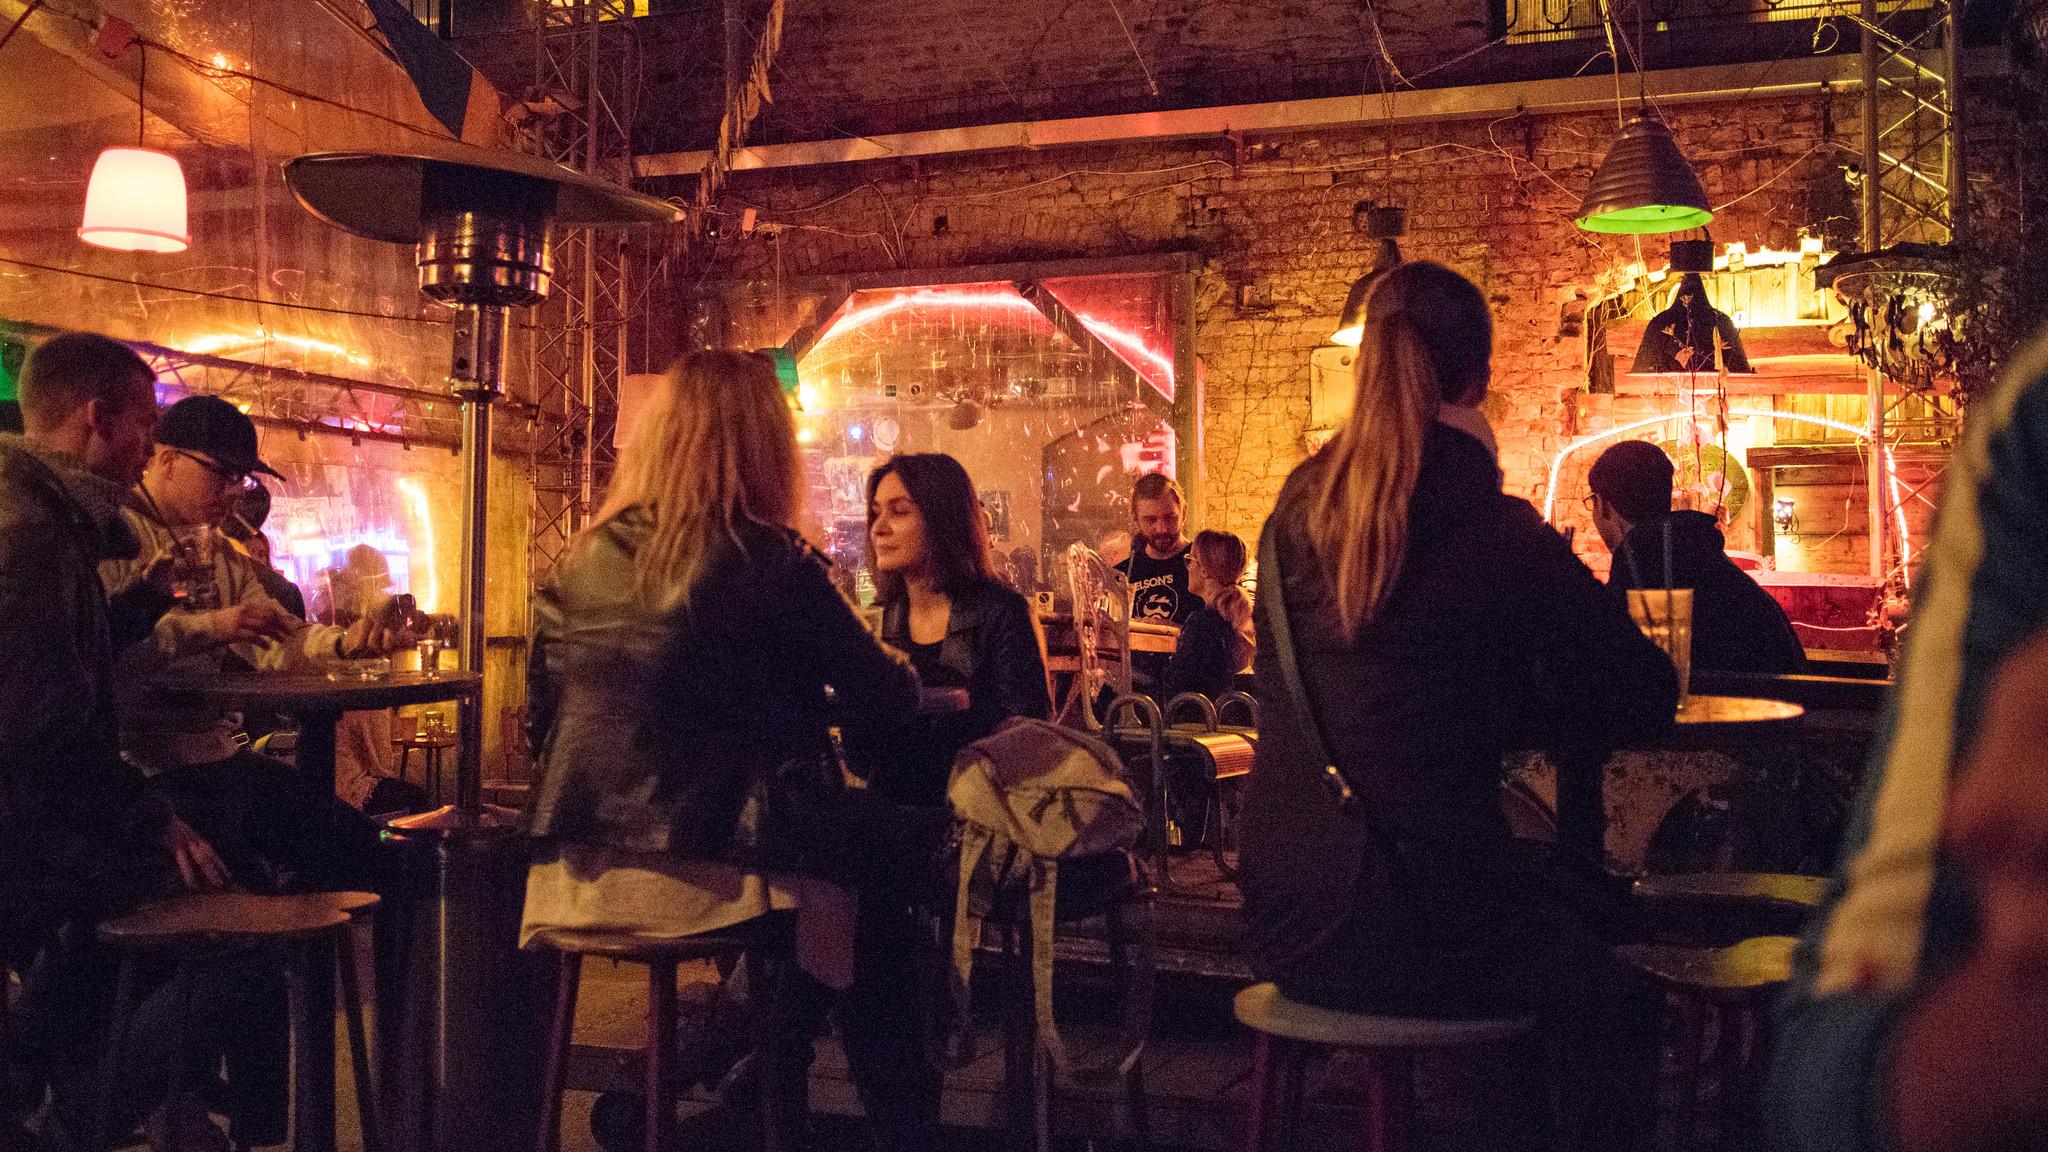 Szimpla Kert Ruin Pubs, Budapest. Foto di Tereknova